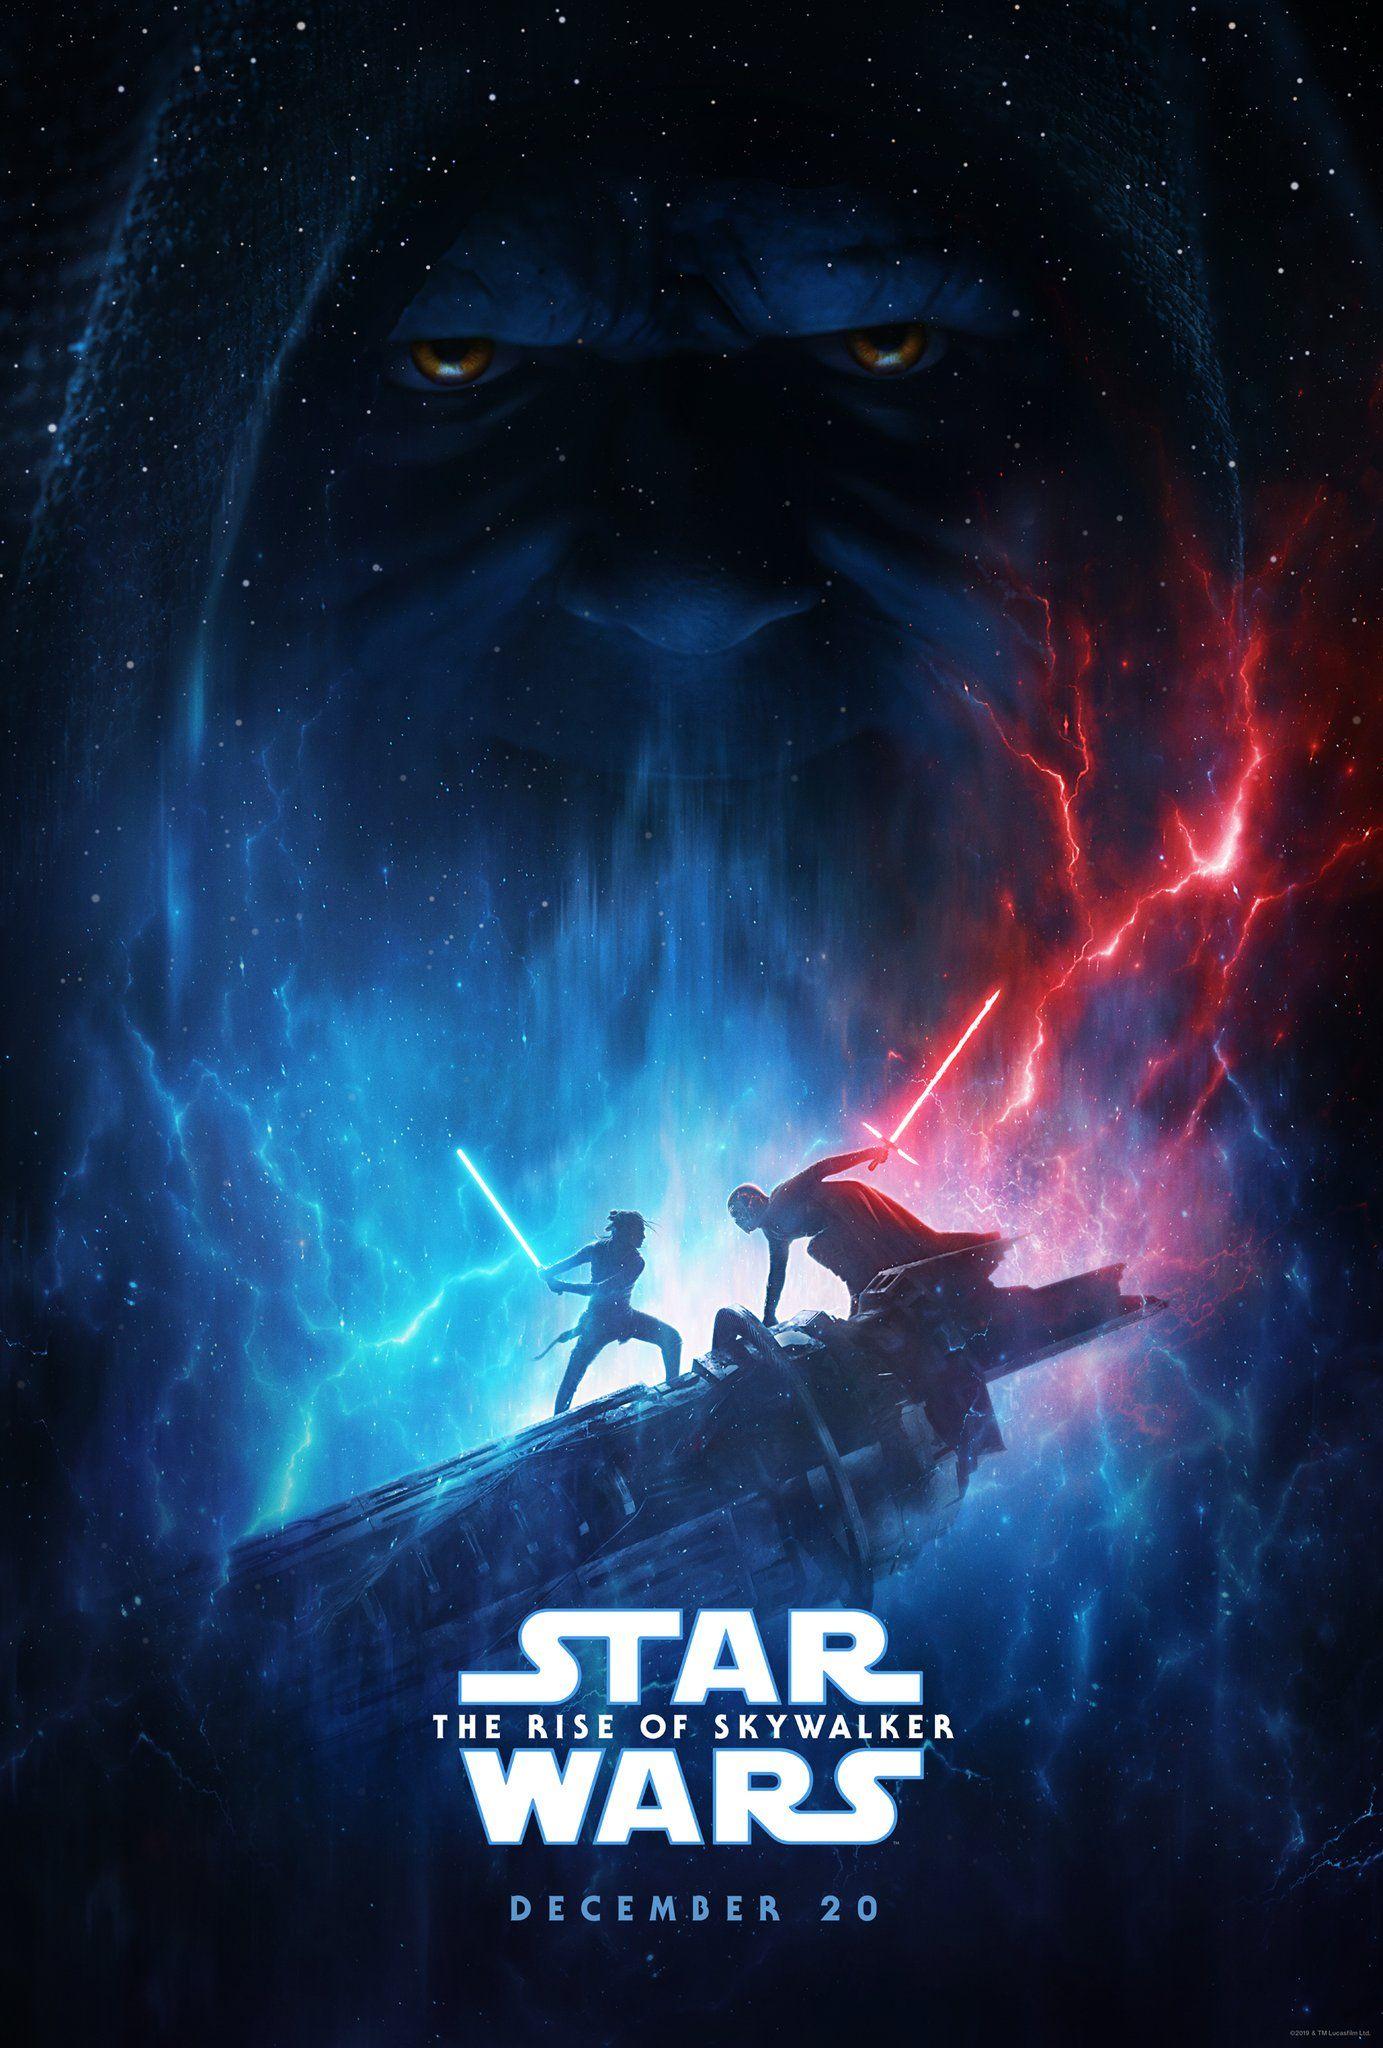 Star Wars 9 The Rise Of Skywalker Poster Star Wars Poster Star Wars Episodes Star Wars Watch